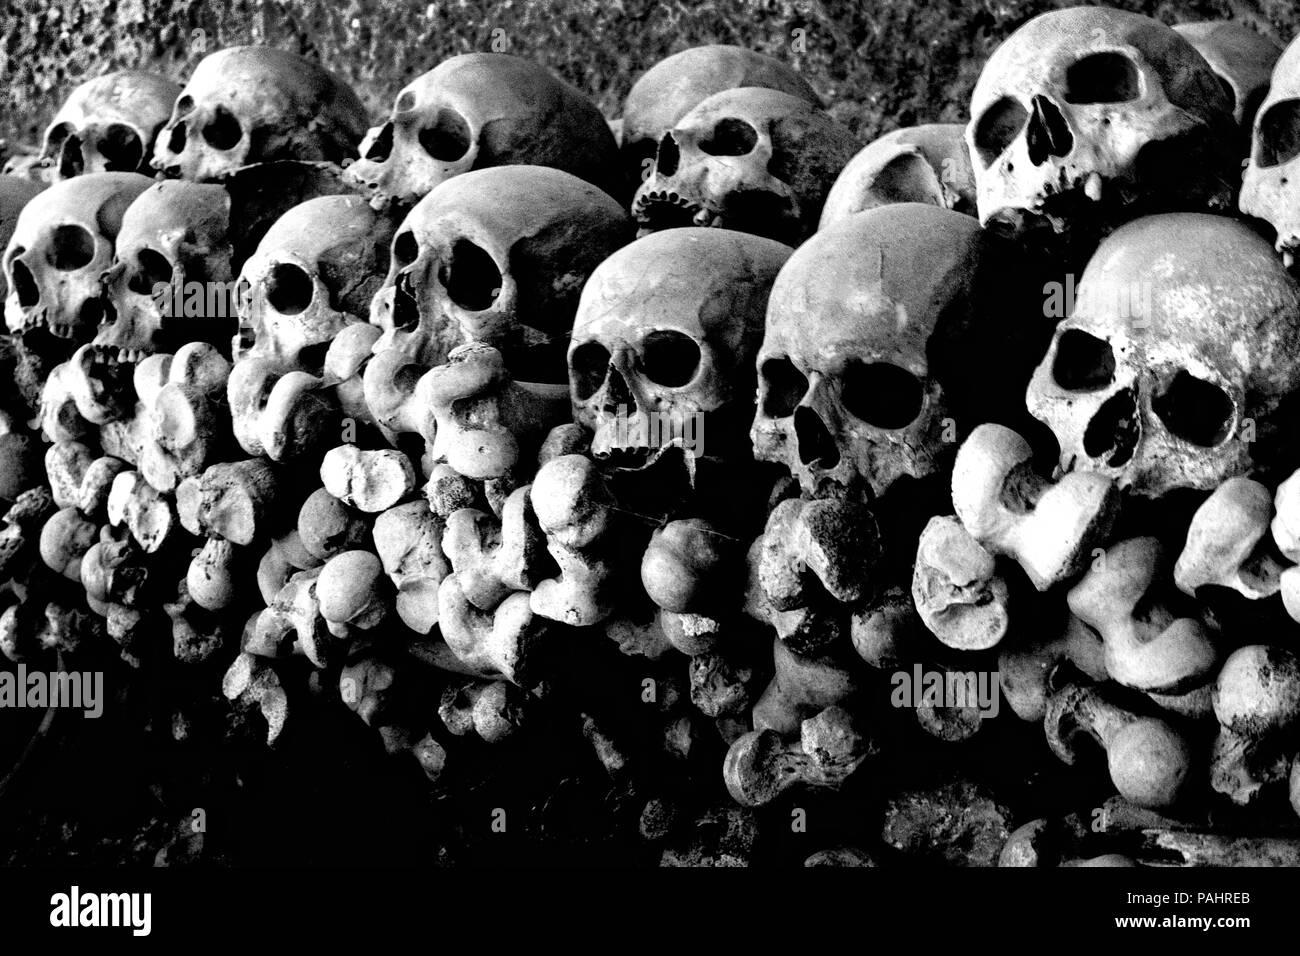 Skulls at the 'Cimitero delle Fontanelle', Naples Health district - Stock Image